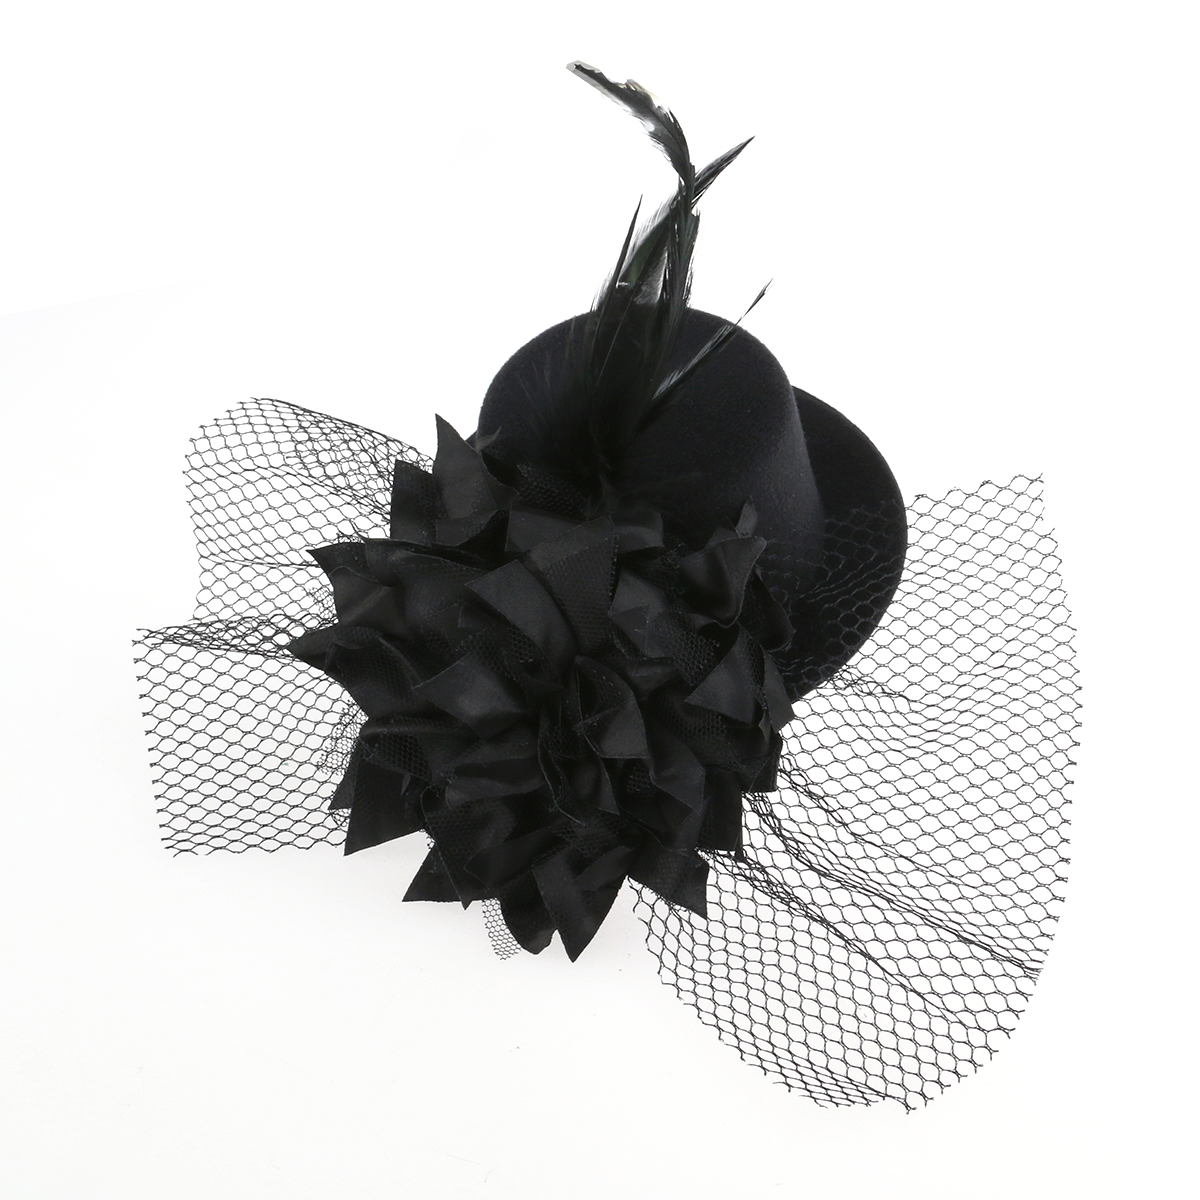 ccefc1649 Hot Sale] Burlesque Gothic Glitter Mini Top Hat Party Wedding Dance ...